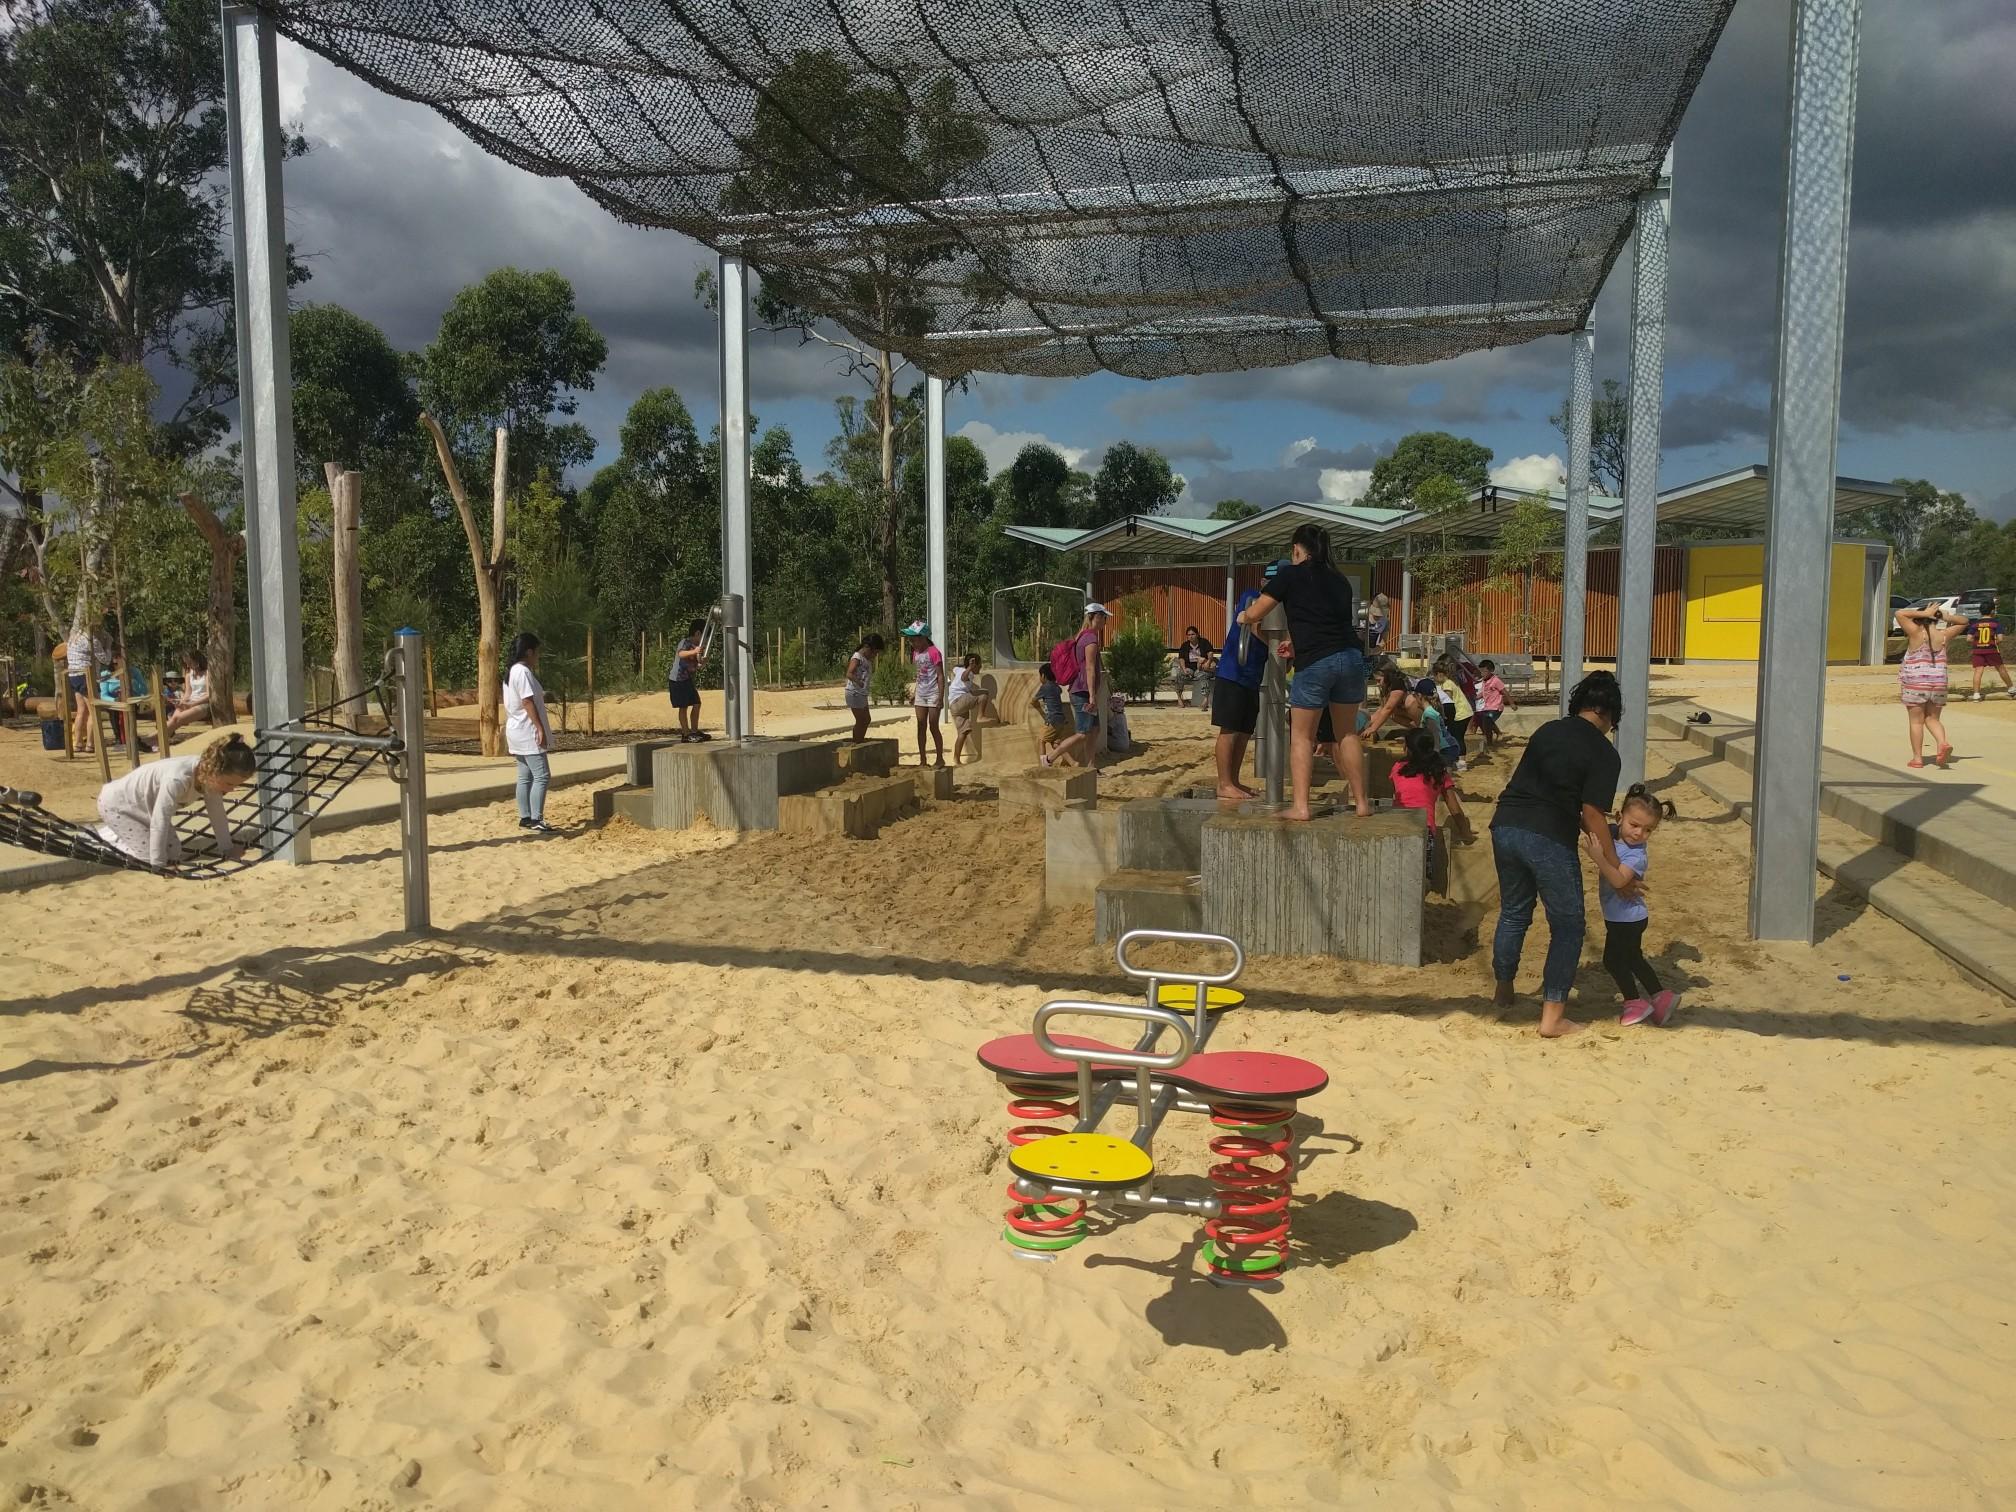 Bungarribee Park